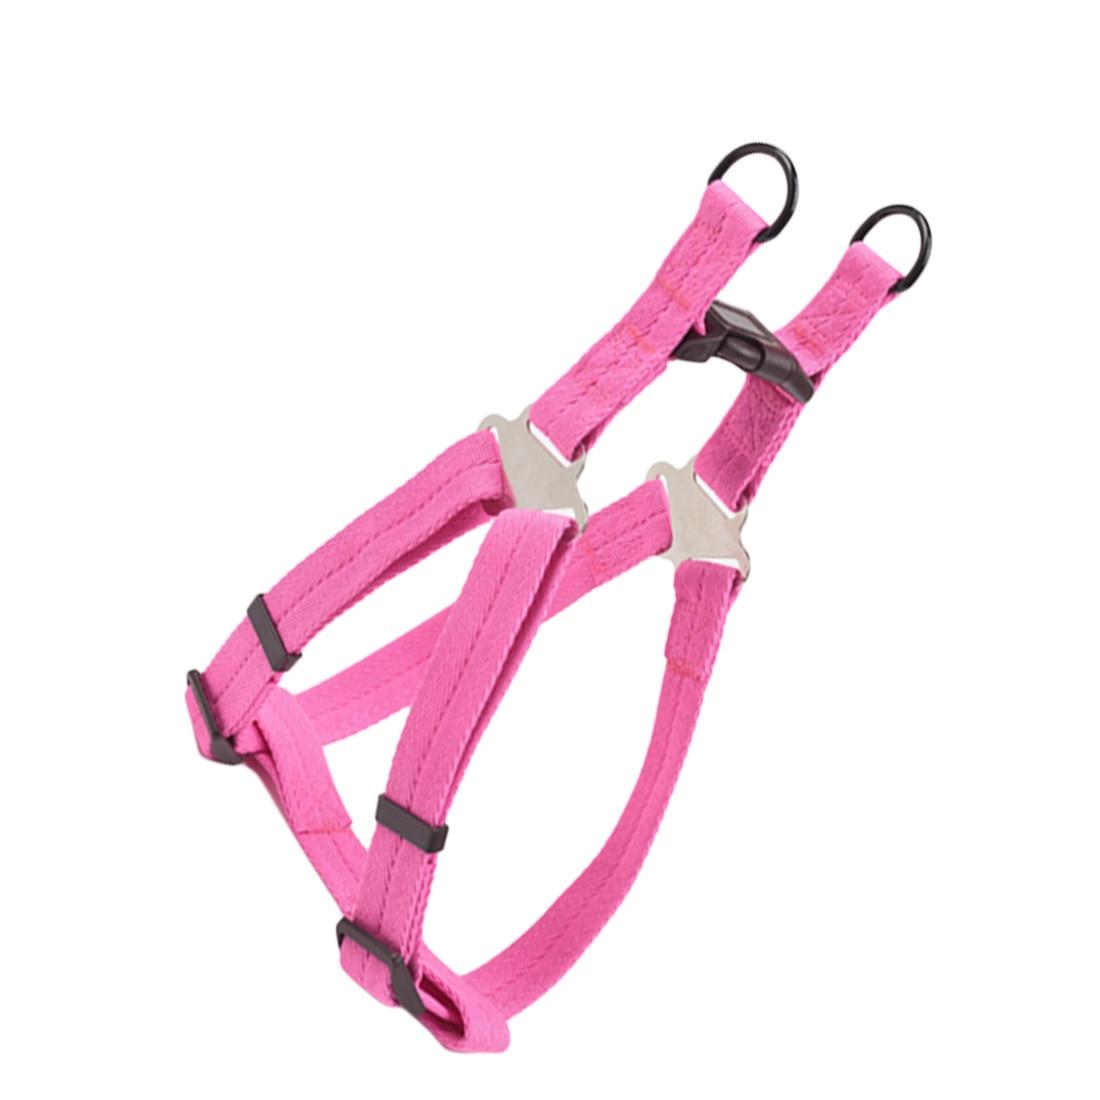 1Pc Adjustable Nylon Rope Pet Dog Puppy Cat Lead Leash Harness Walking Chest Strap Pet Lead Leash Pet Supplies